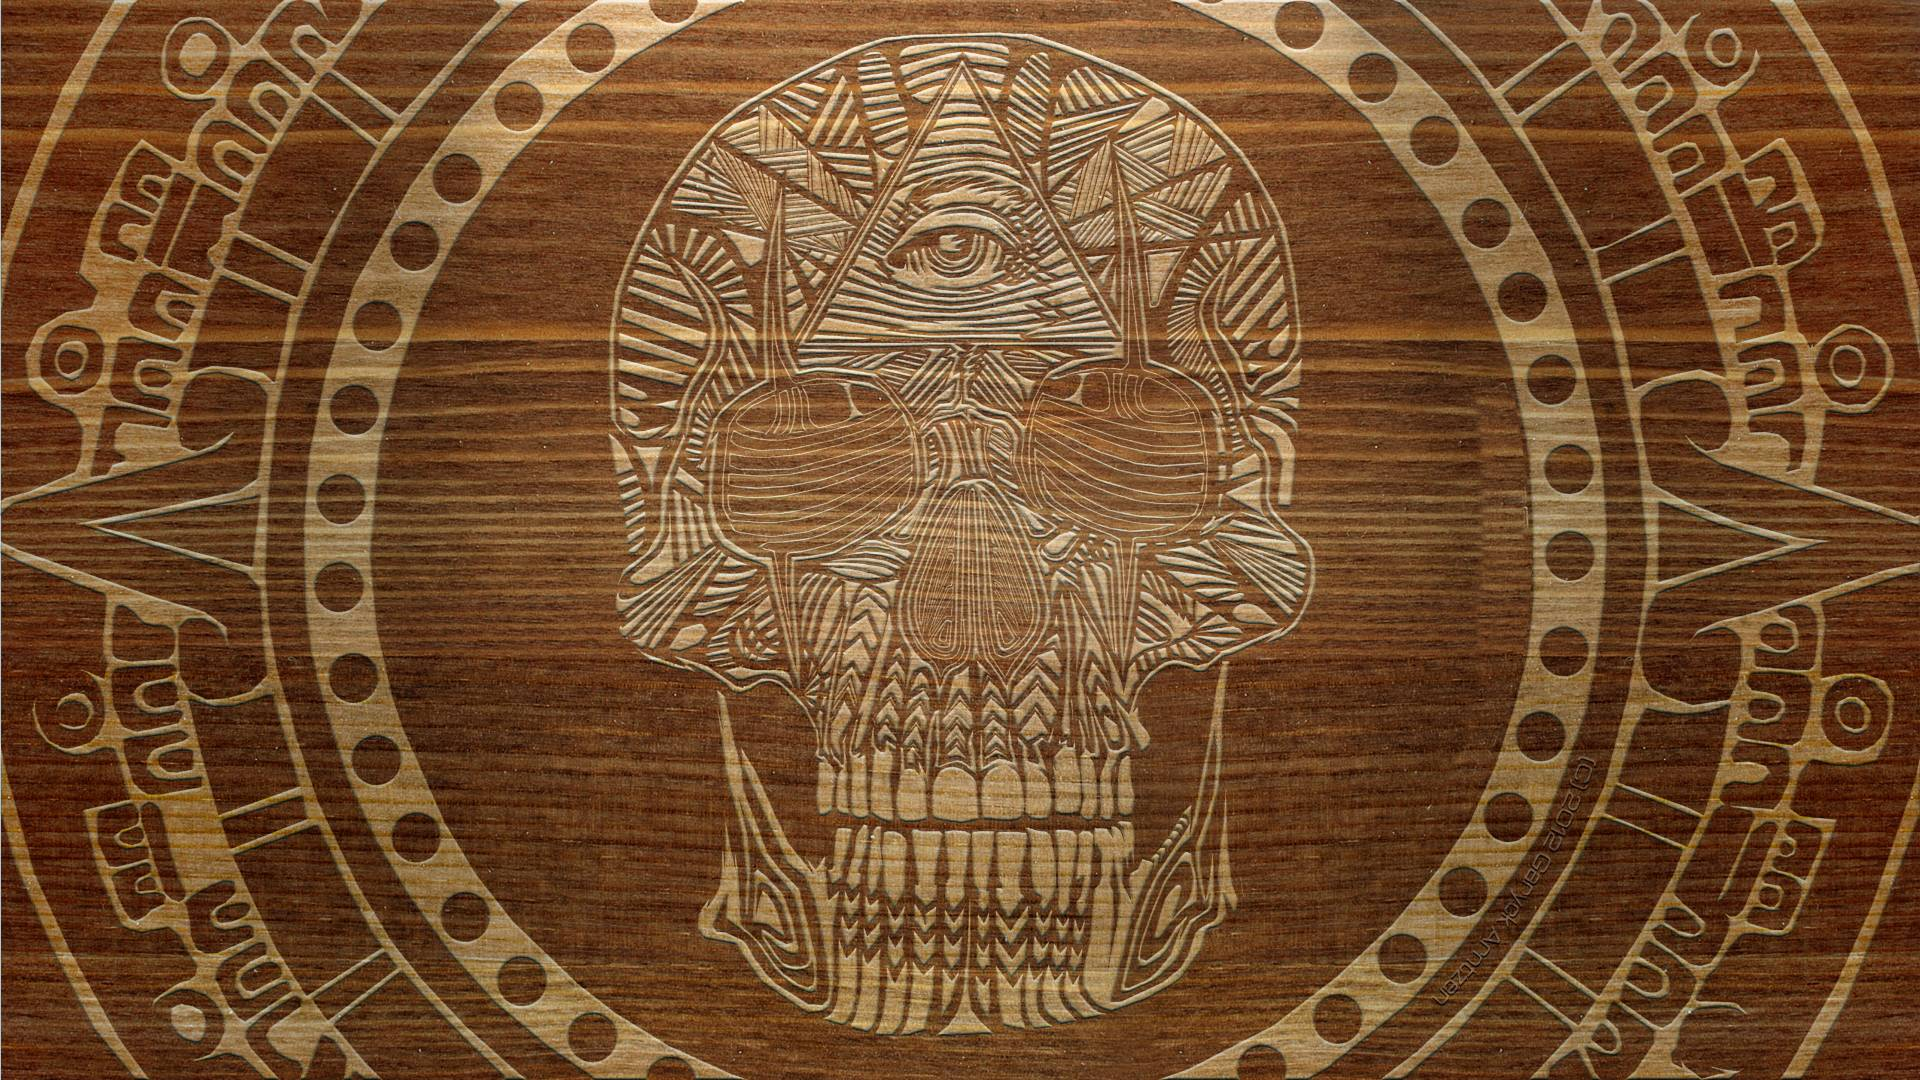 illuminati symbol wallpaper 1920x1080 - photo #17